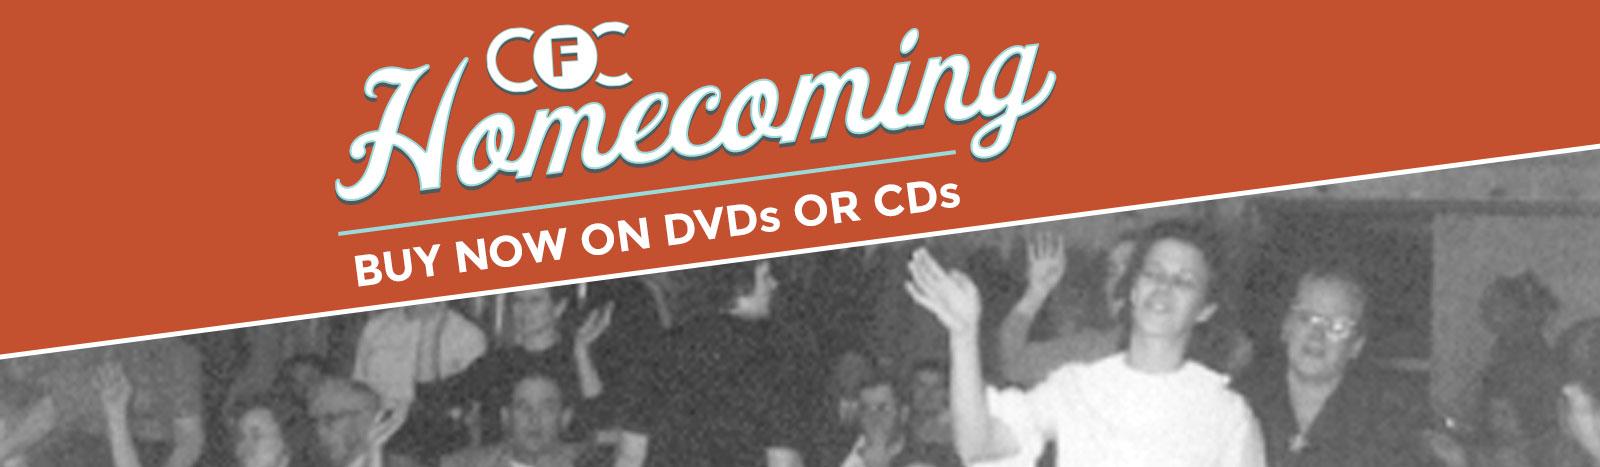 2016-cfc-homecoming-promo